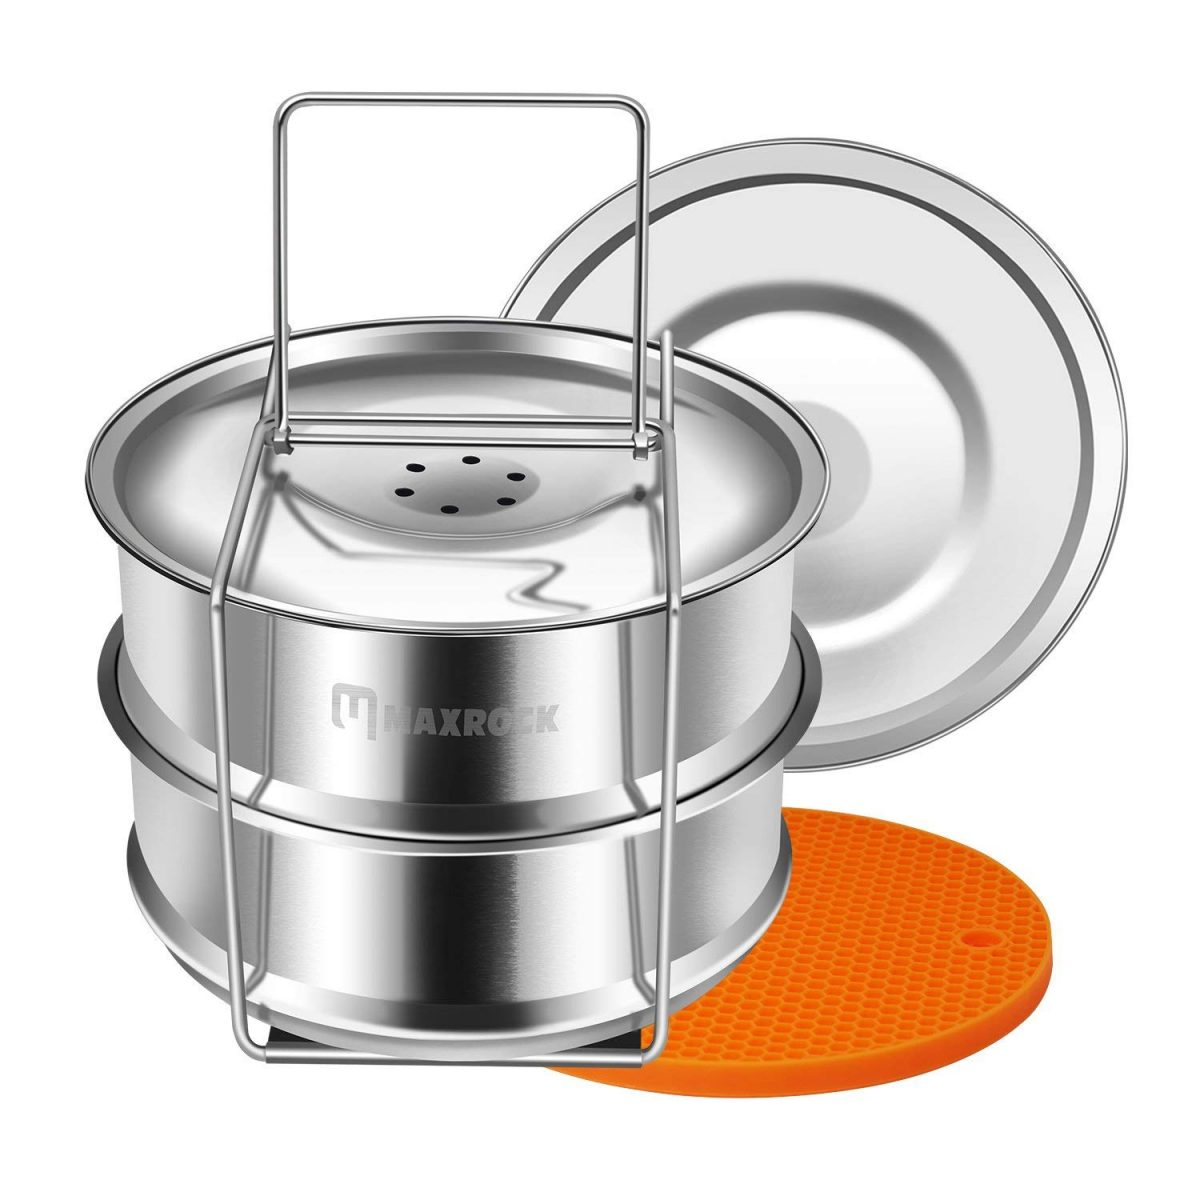 steamer-insert-pans-instant-pot